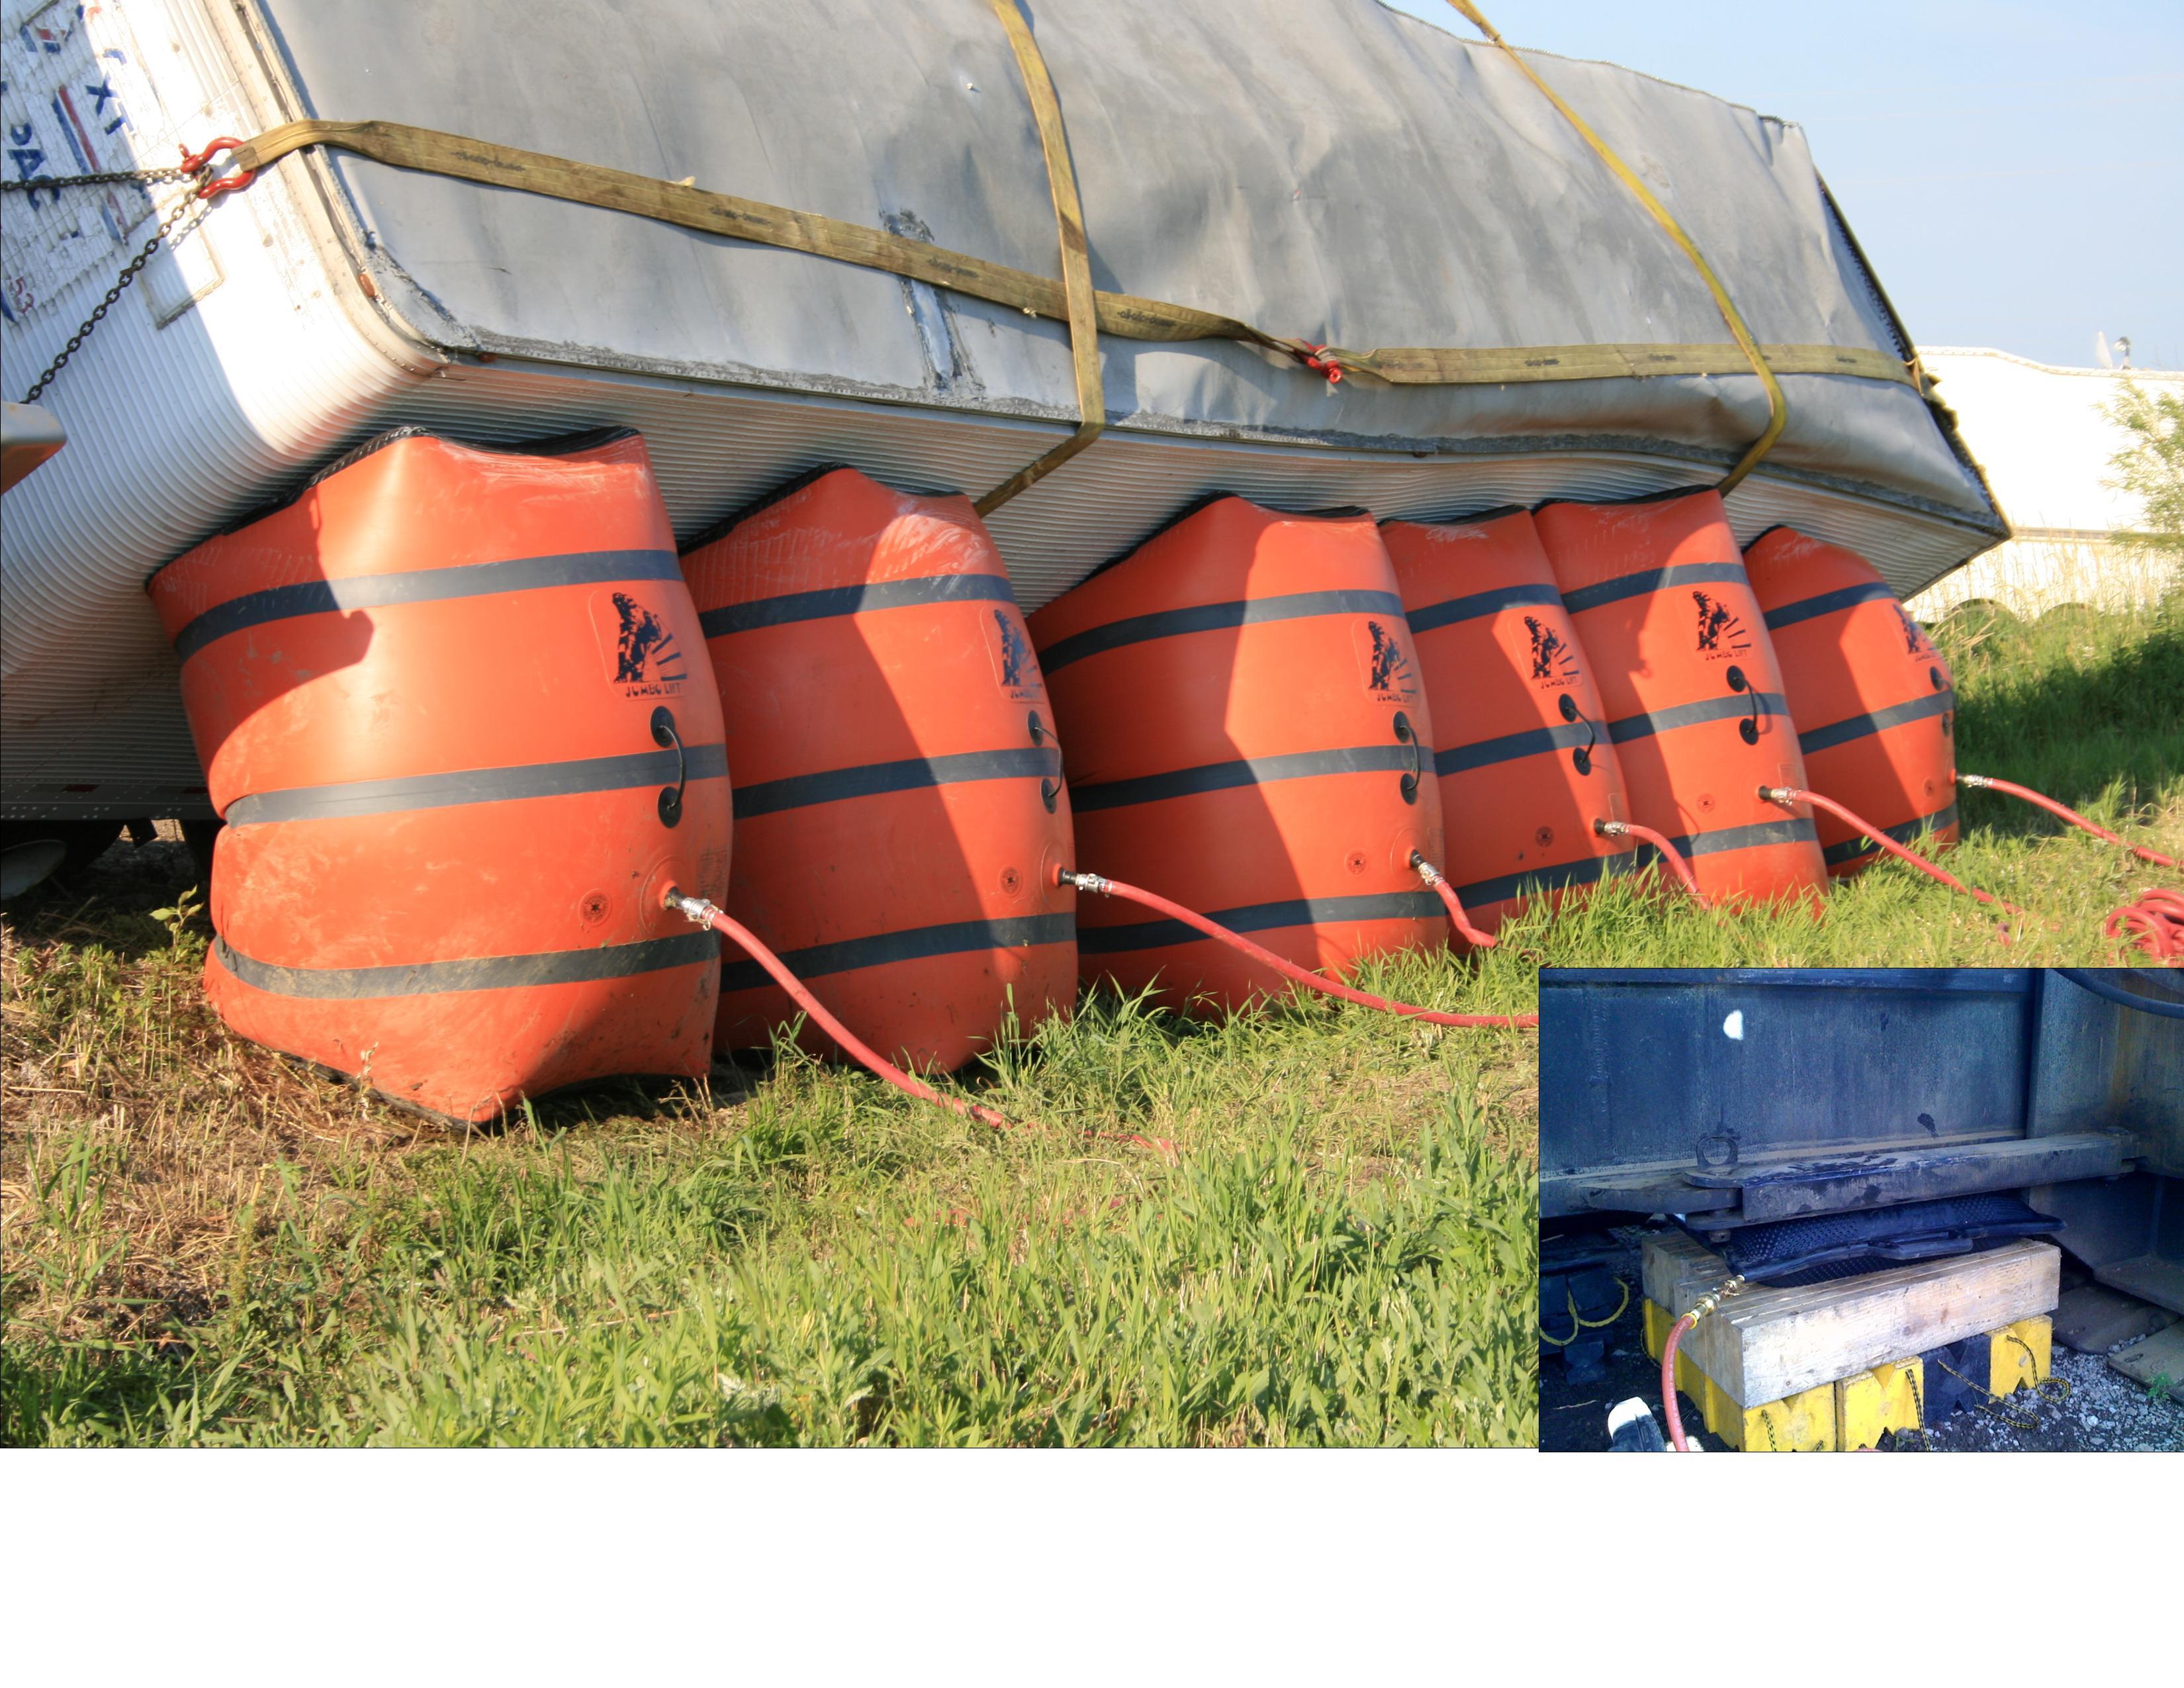 air ton high matjack grey steel products mat aramid pressure jack or bag jacks mats inflatable airlifting